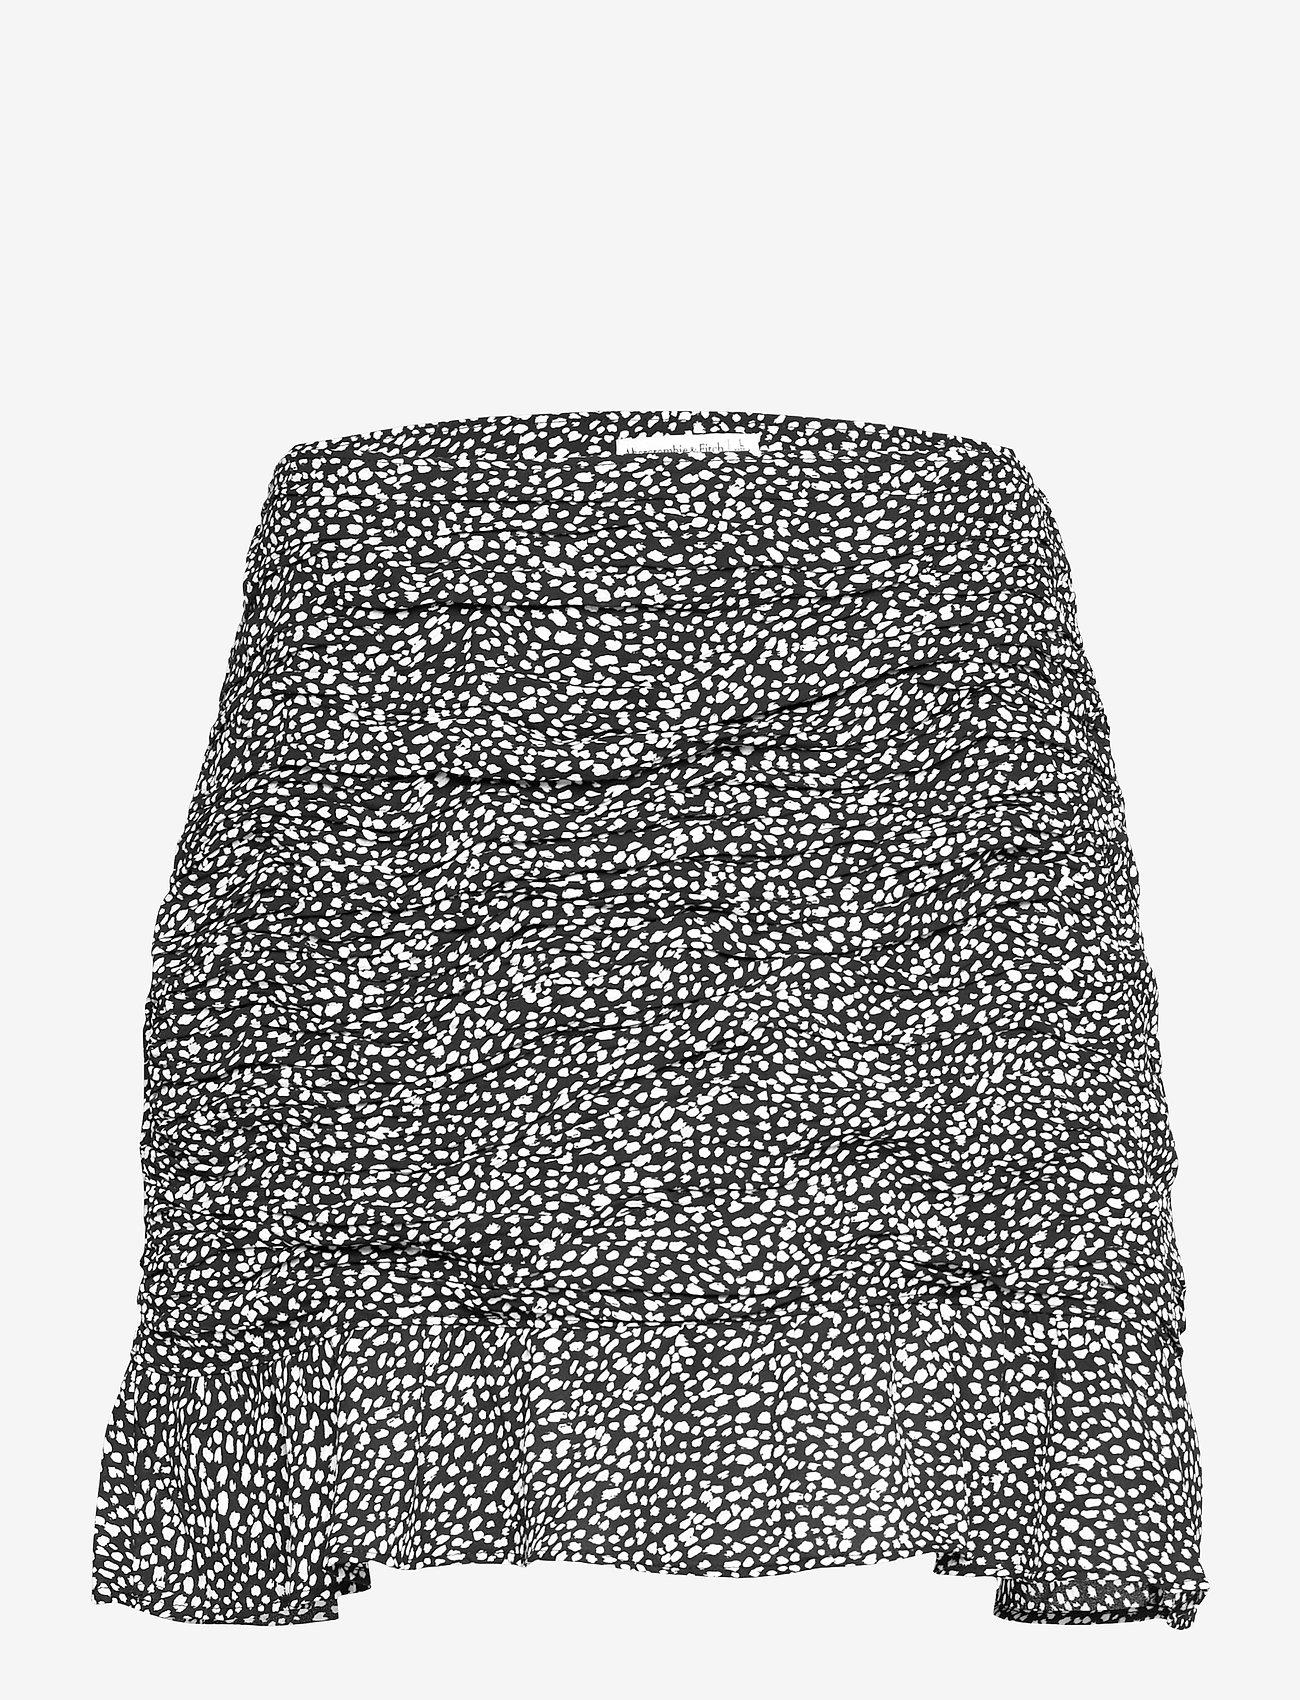 Abercrombie & Fitch - ANF WOMENS SKIRTS - korta kjolar - black dotted print - 0